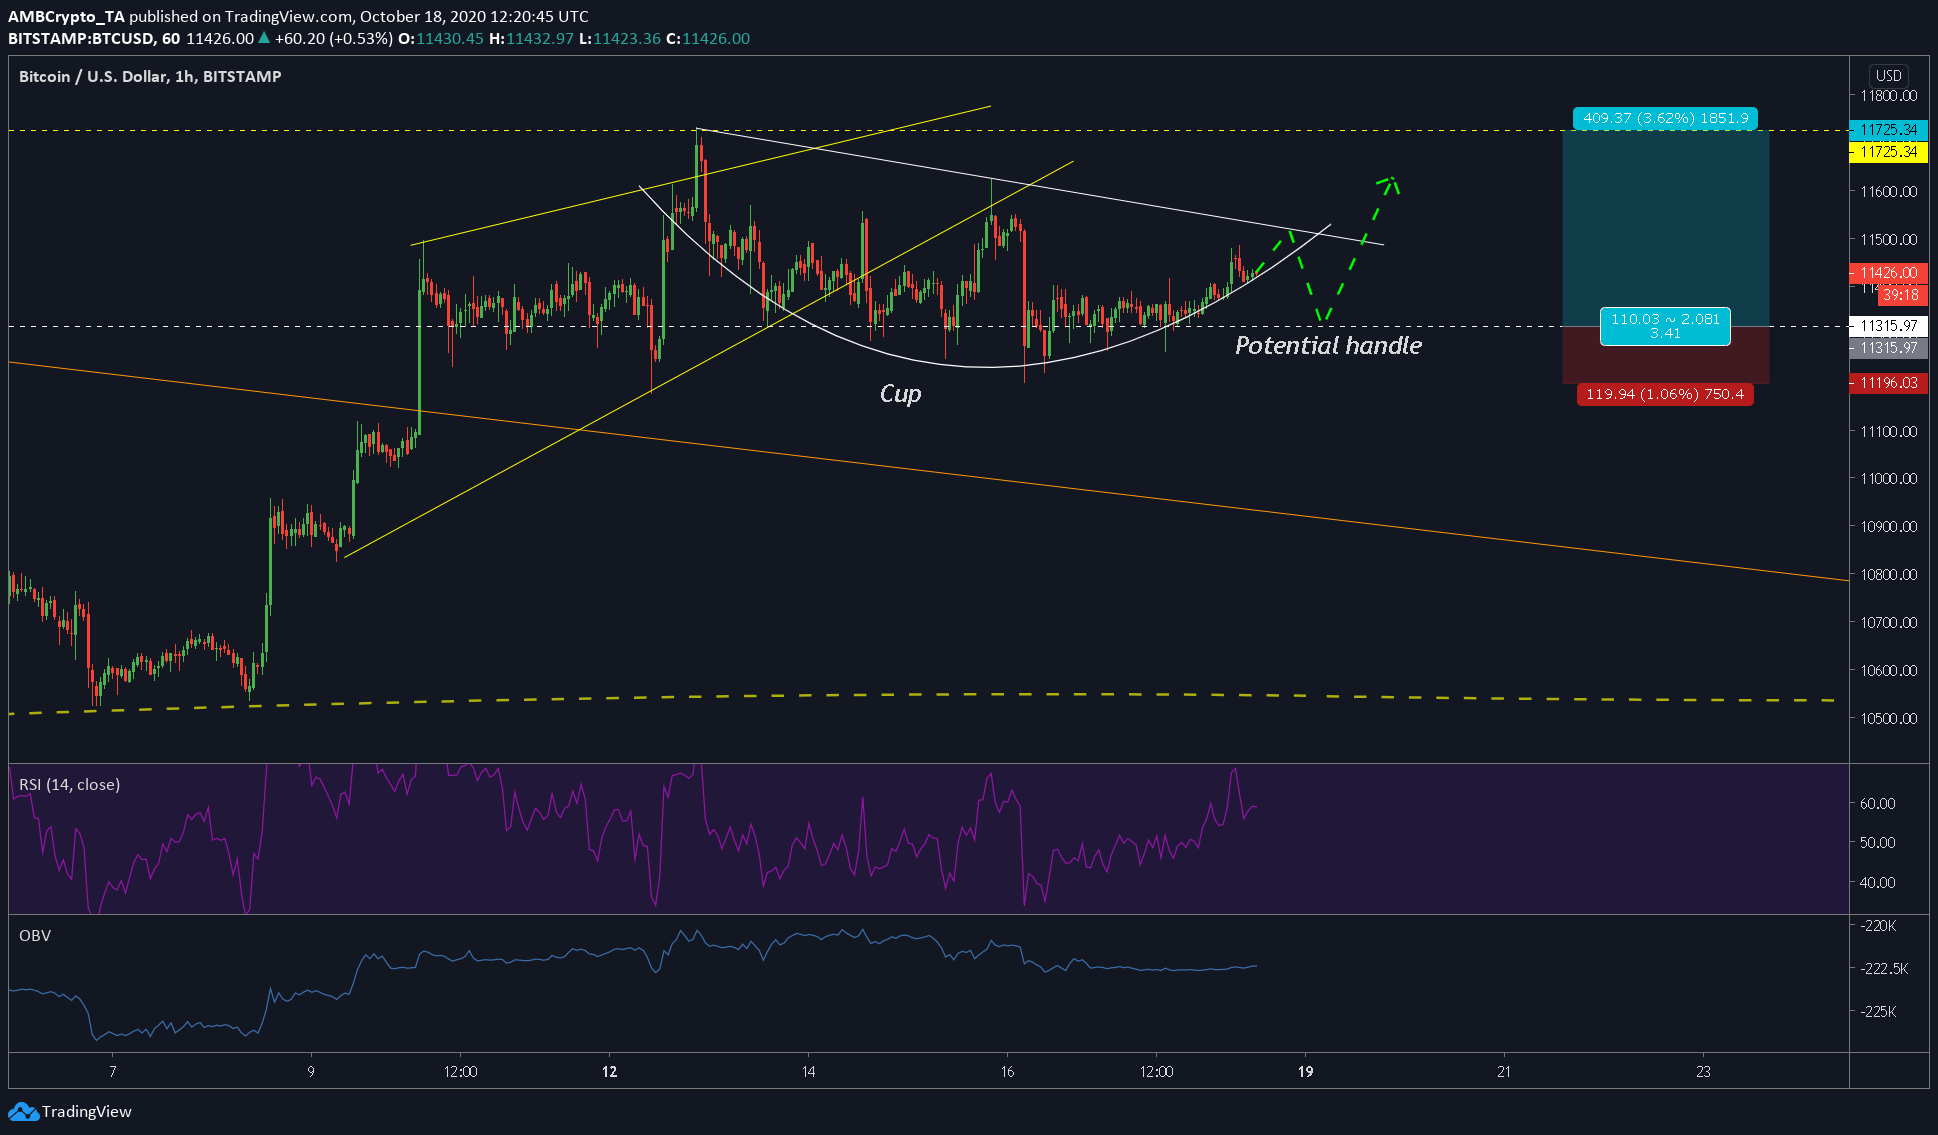 Análisis de precios de Bitcoin a corto plazo: 18 de octubre